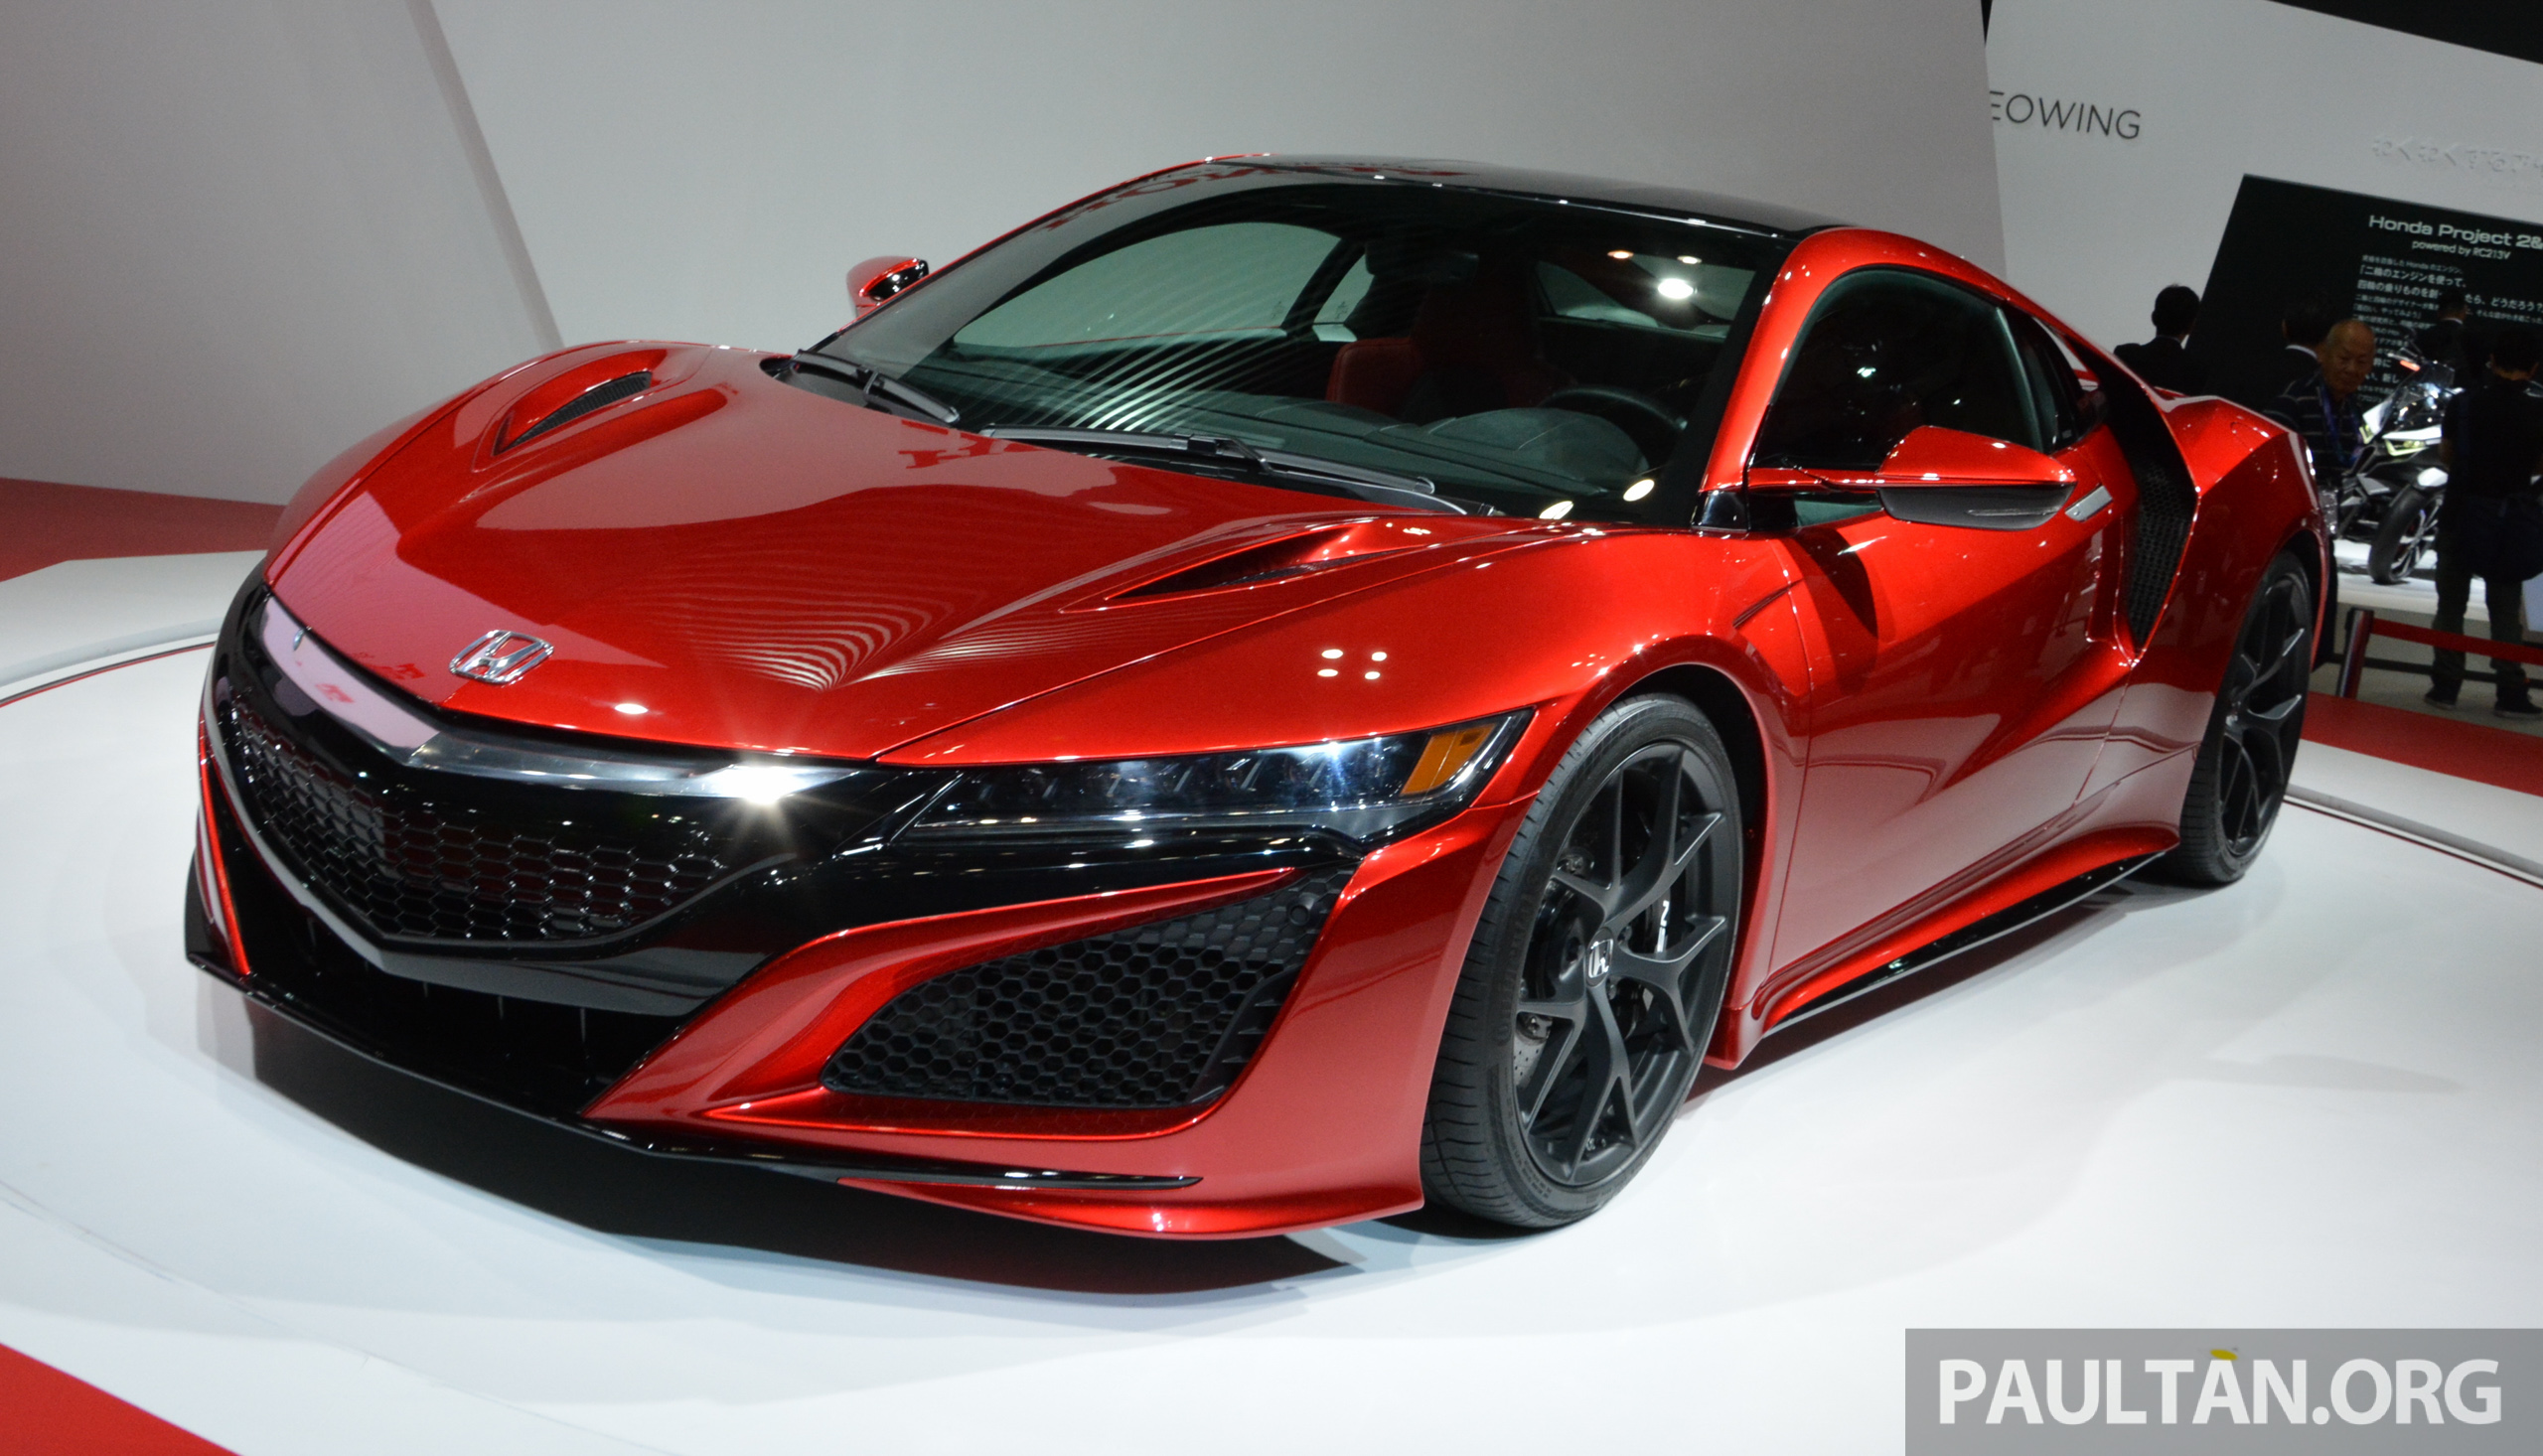 Honda Nsx Price Auto Cars